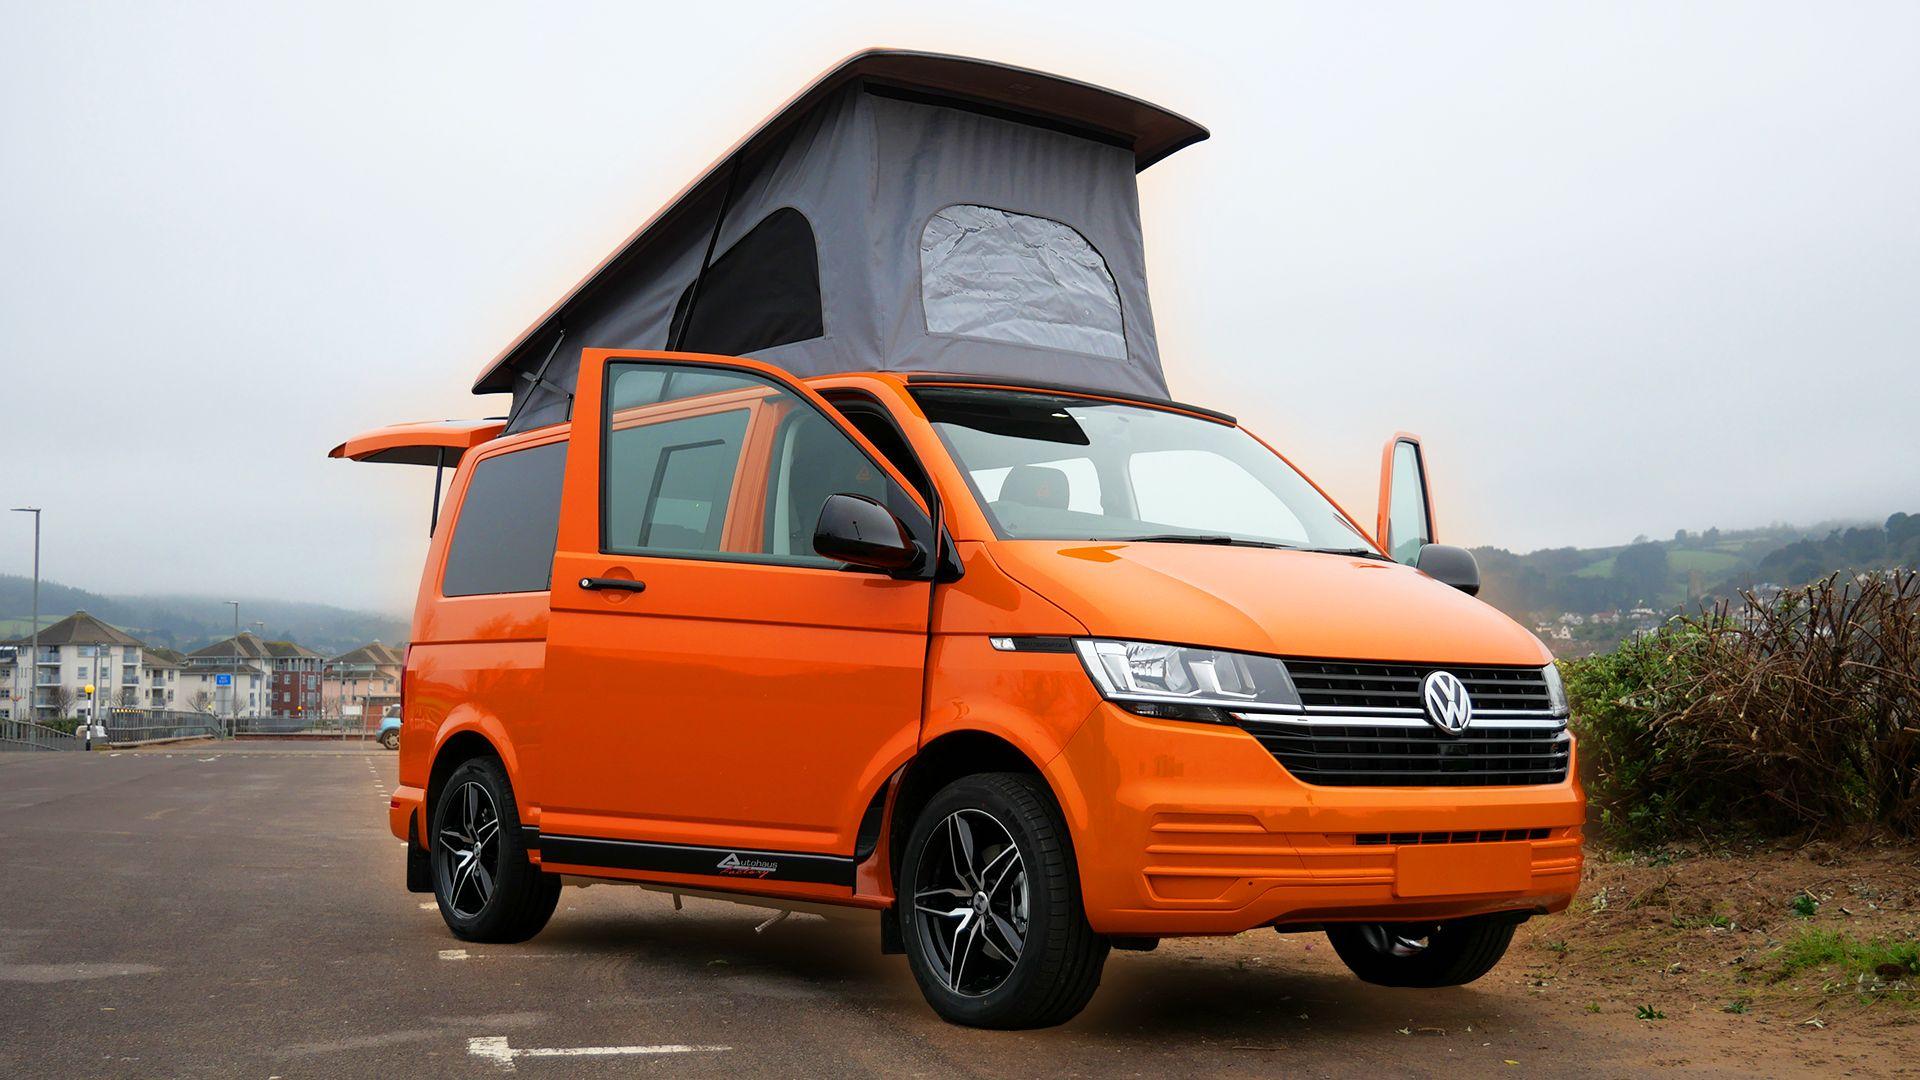 Vw T6 1 Camper Is The First Custom Conversion Of Its Kind In 2020 Volkswagen Van Van Life Camper